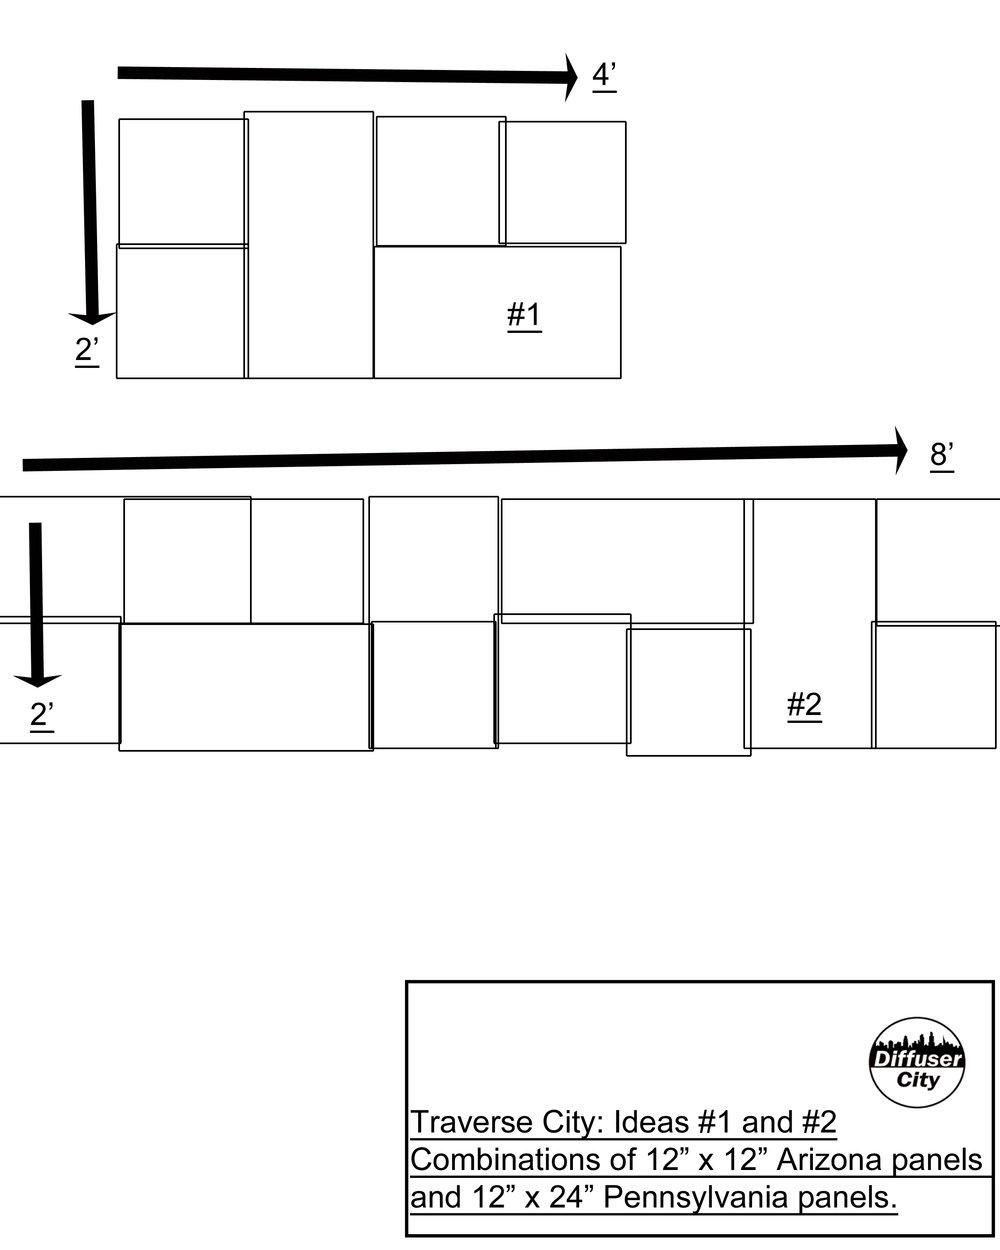 Traverse City Ideas 1-2.jpg